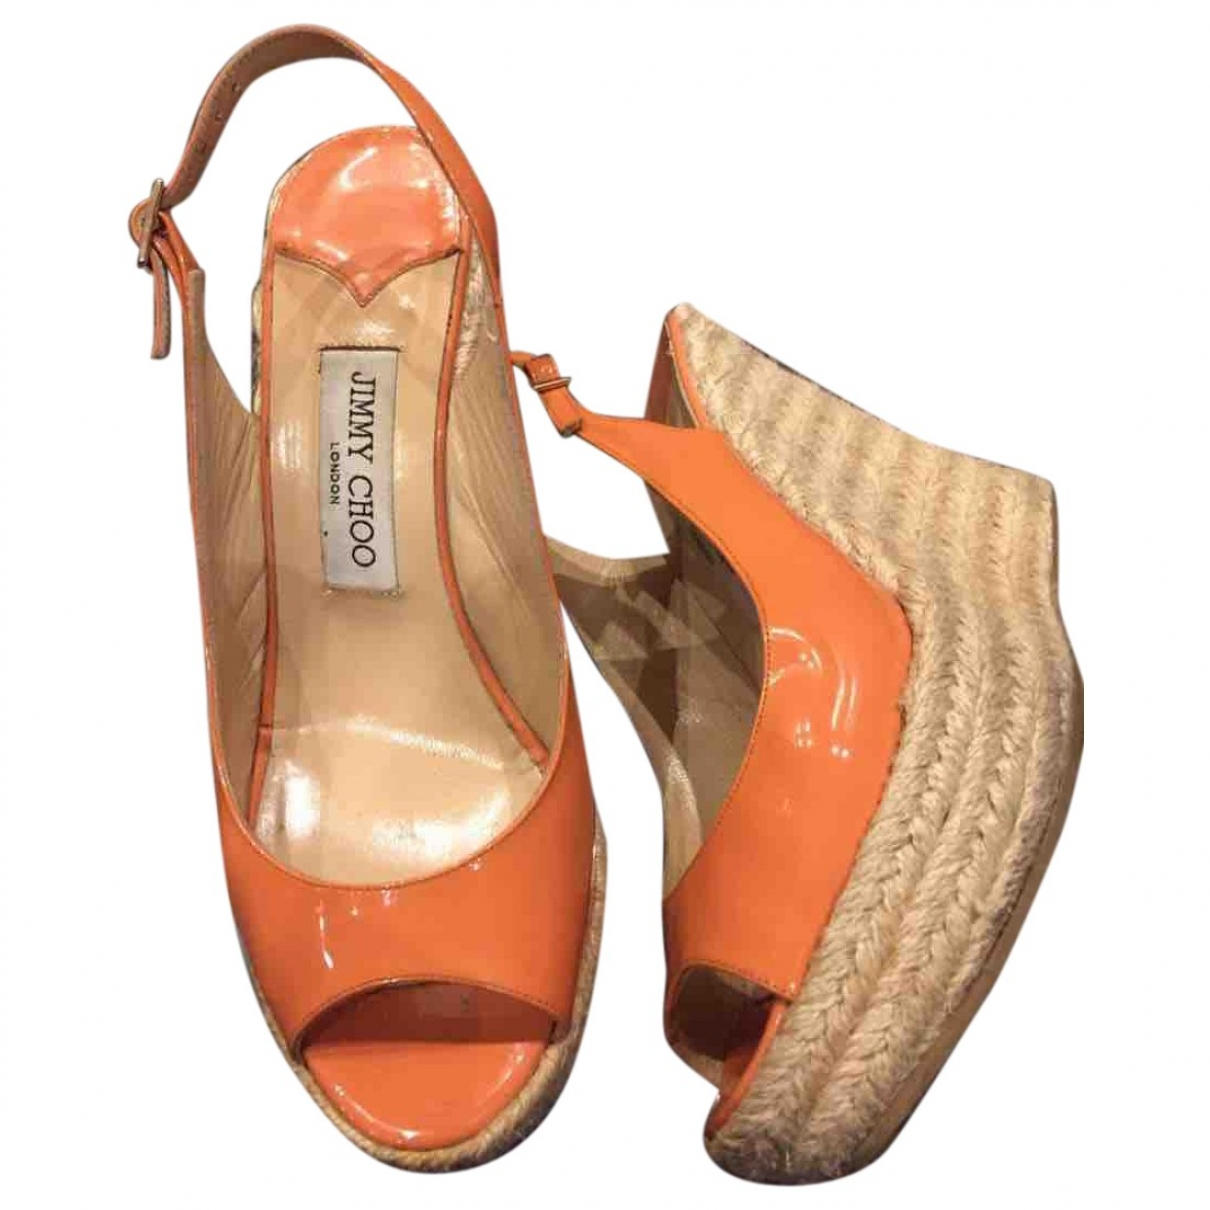 Jimmy Choo - Sandales   pour femme en cuir verni - orange